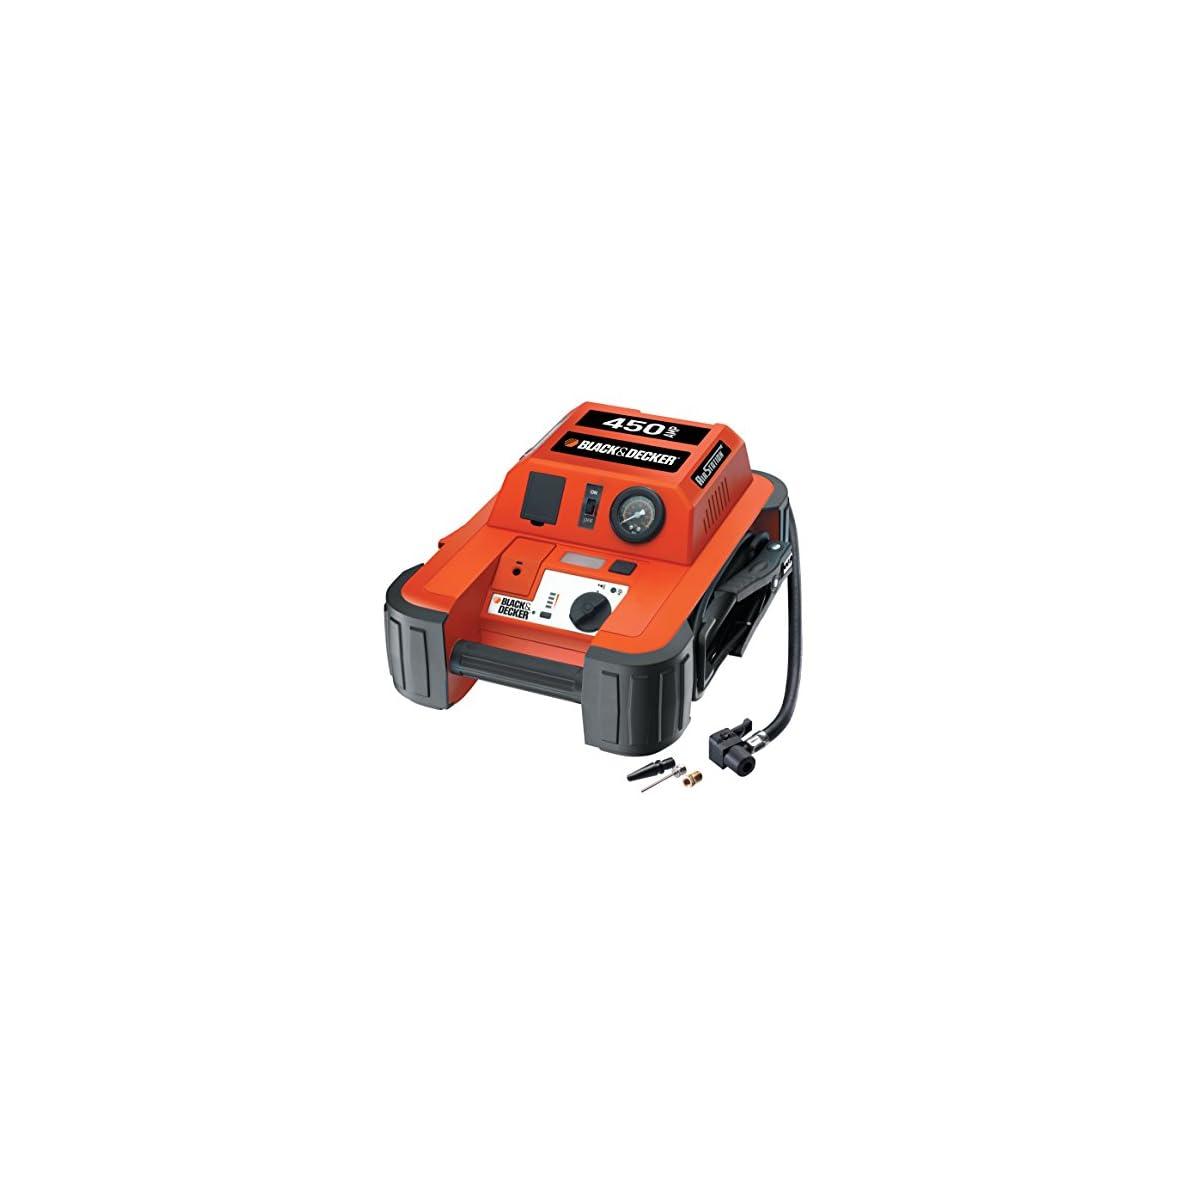 51uo8s6DFhL. SS1200  - Black & Decker BDJS4501 450A Arrancador portátil de baterías con Compressor de 120 PSI, Color Naranja/Negro